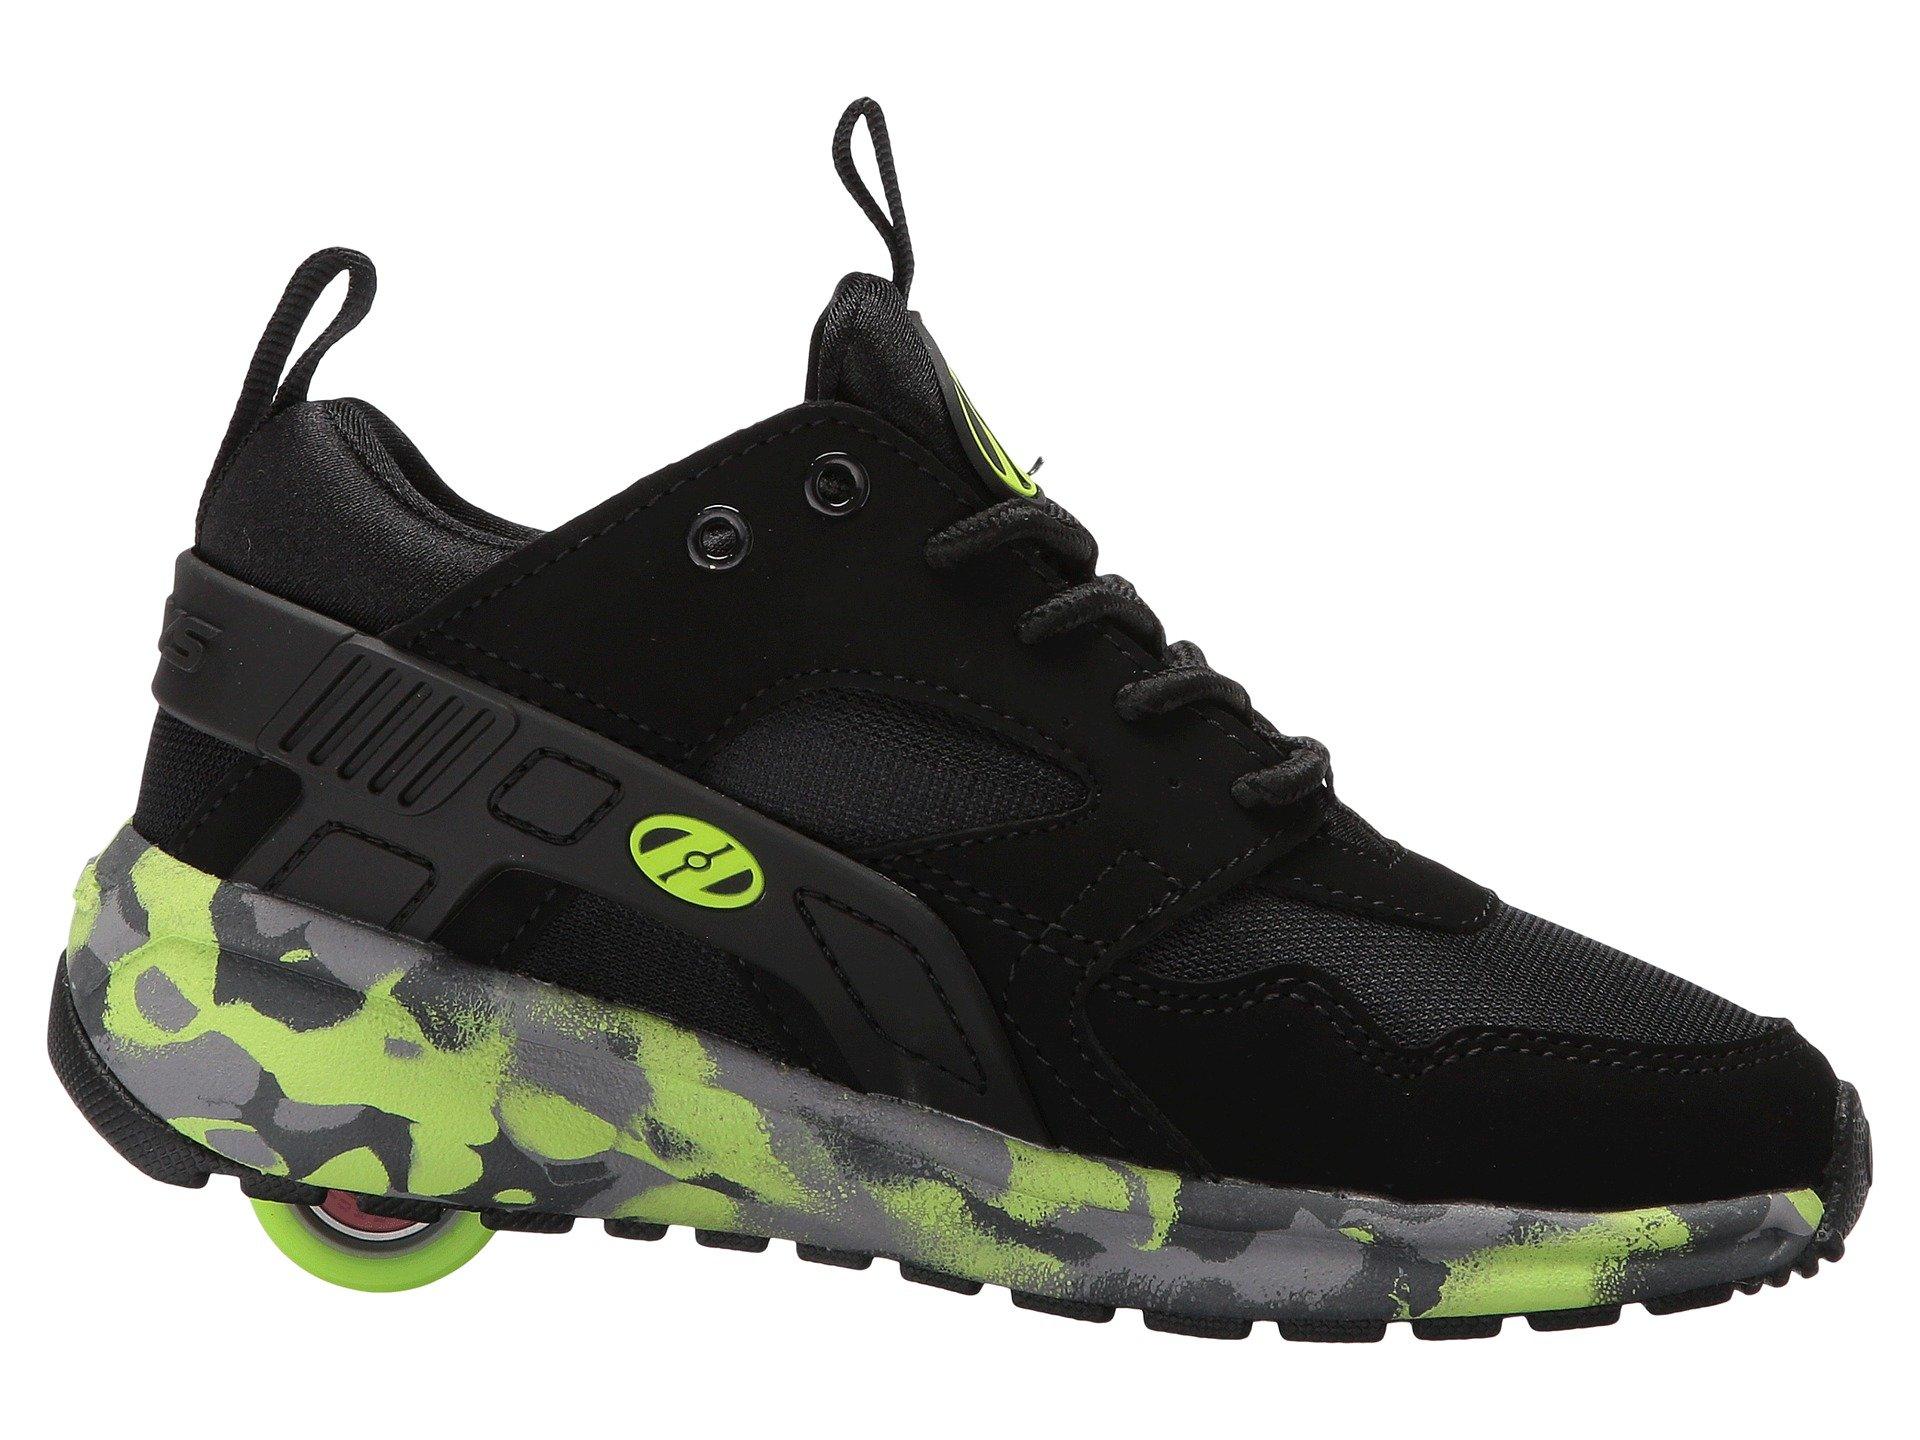 Heelys HE100095H Kid's Force Sneakers, Black/Brightyellow/Confet - 8 by Heelys (Image #8)